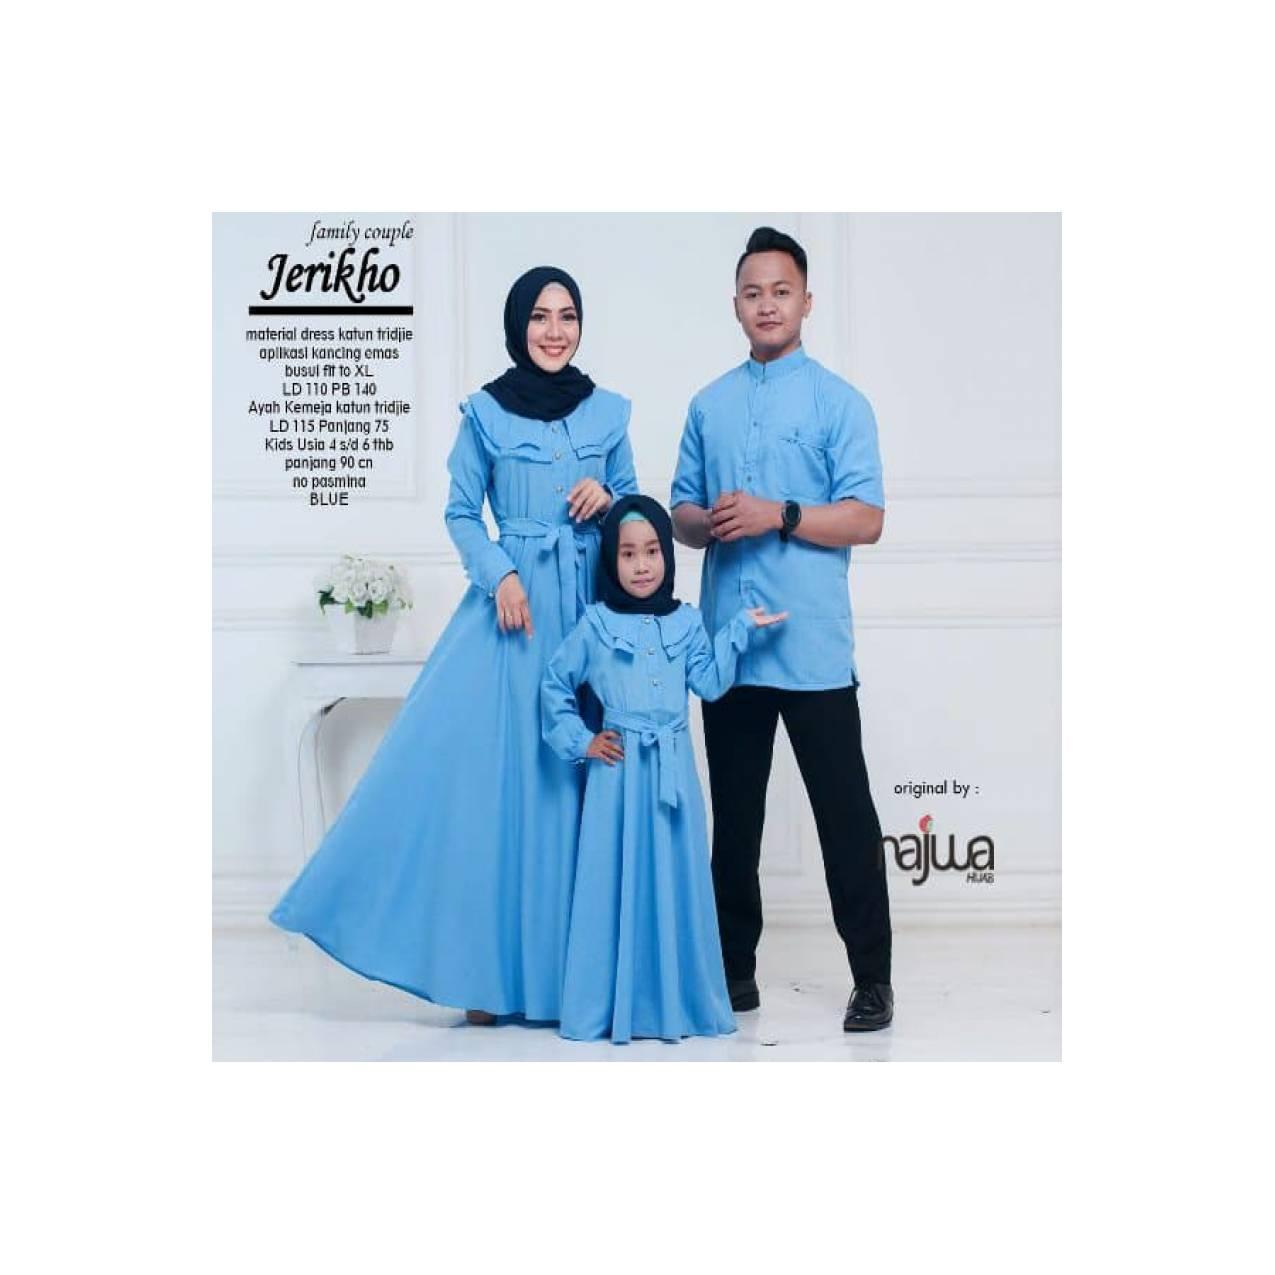 0002987 Baju gamis dan kemeja ibu anak ayah jerikho couple family ori